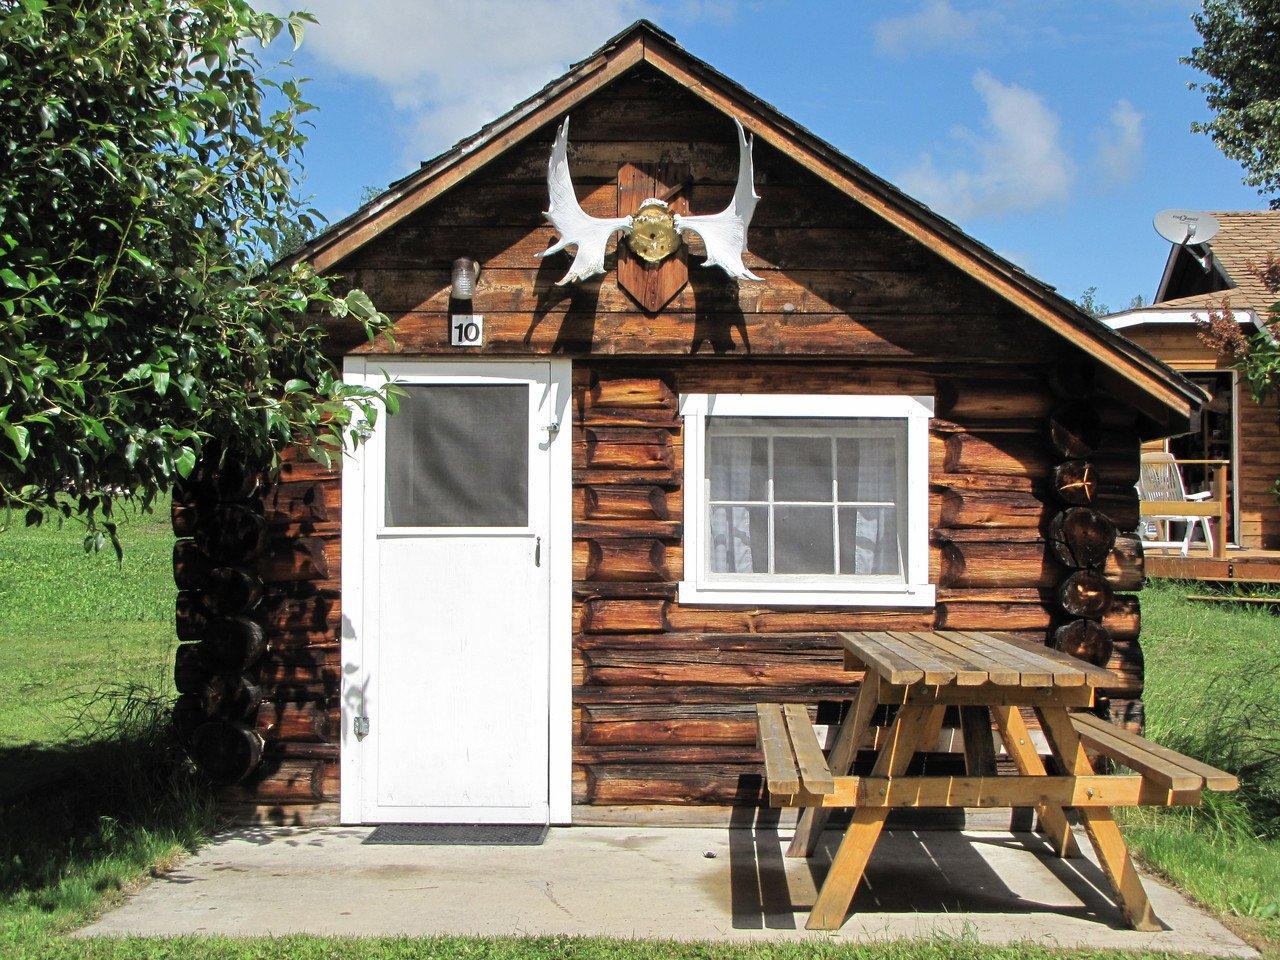 Rustic Cabin #10